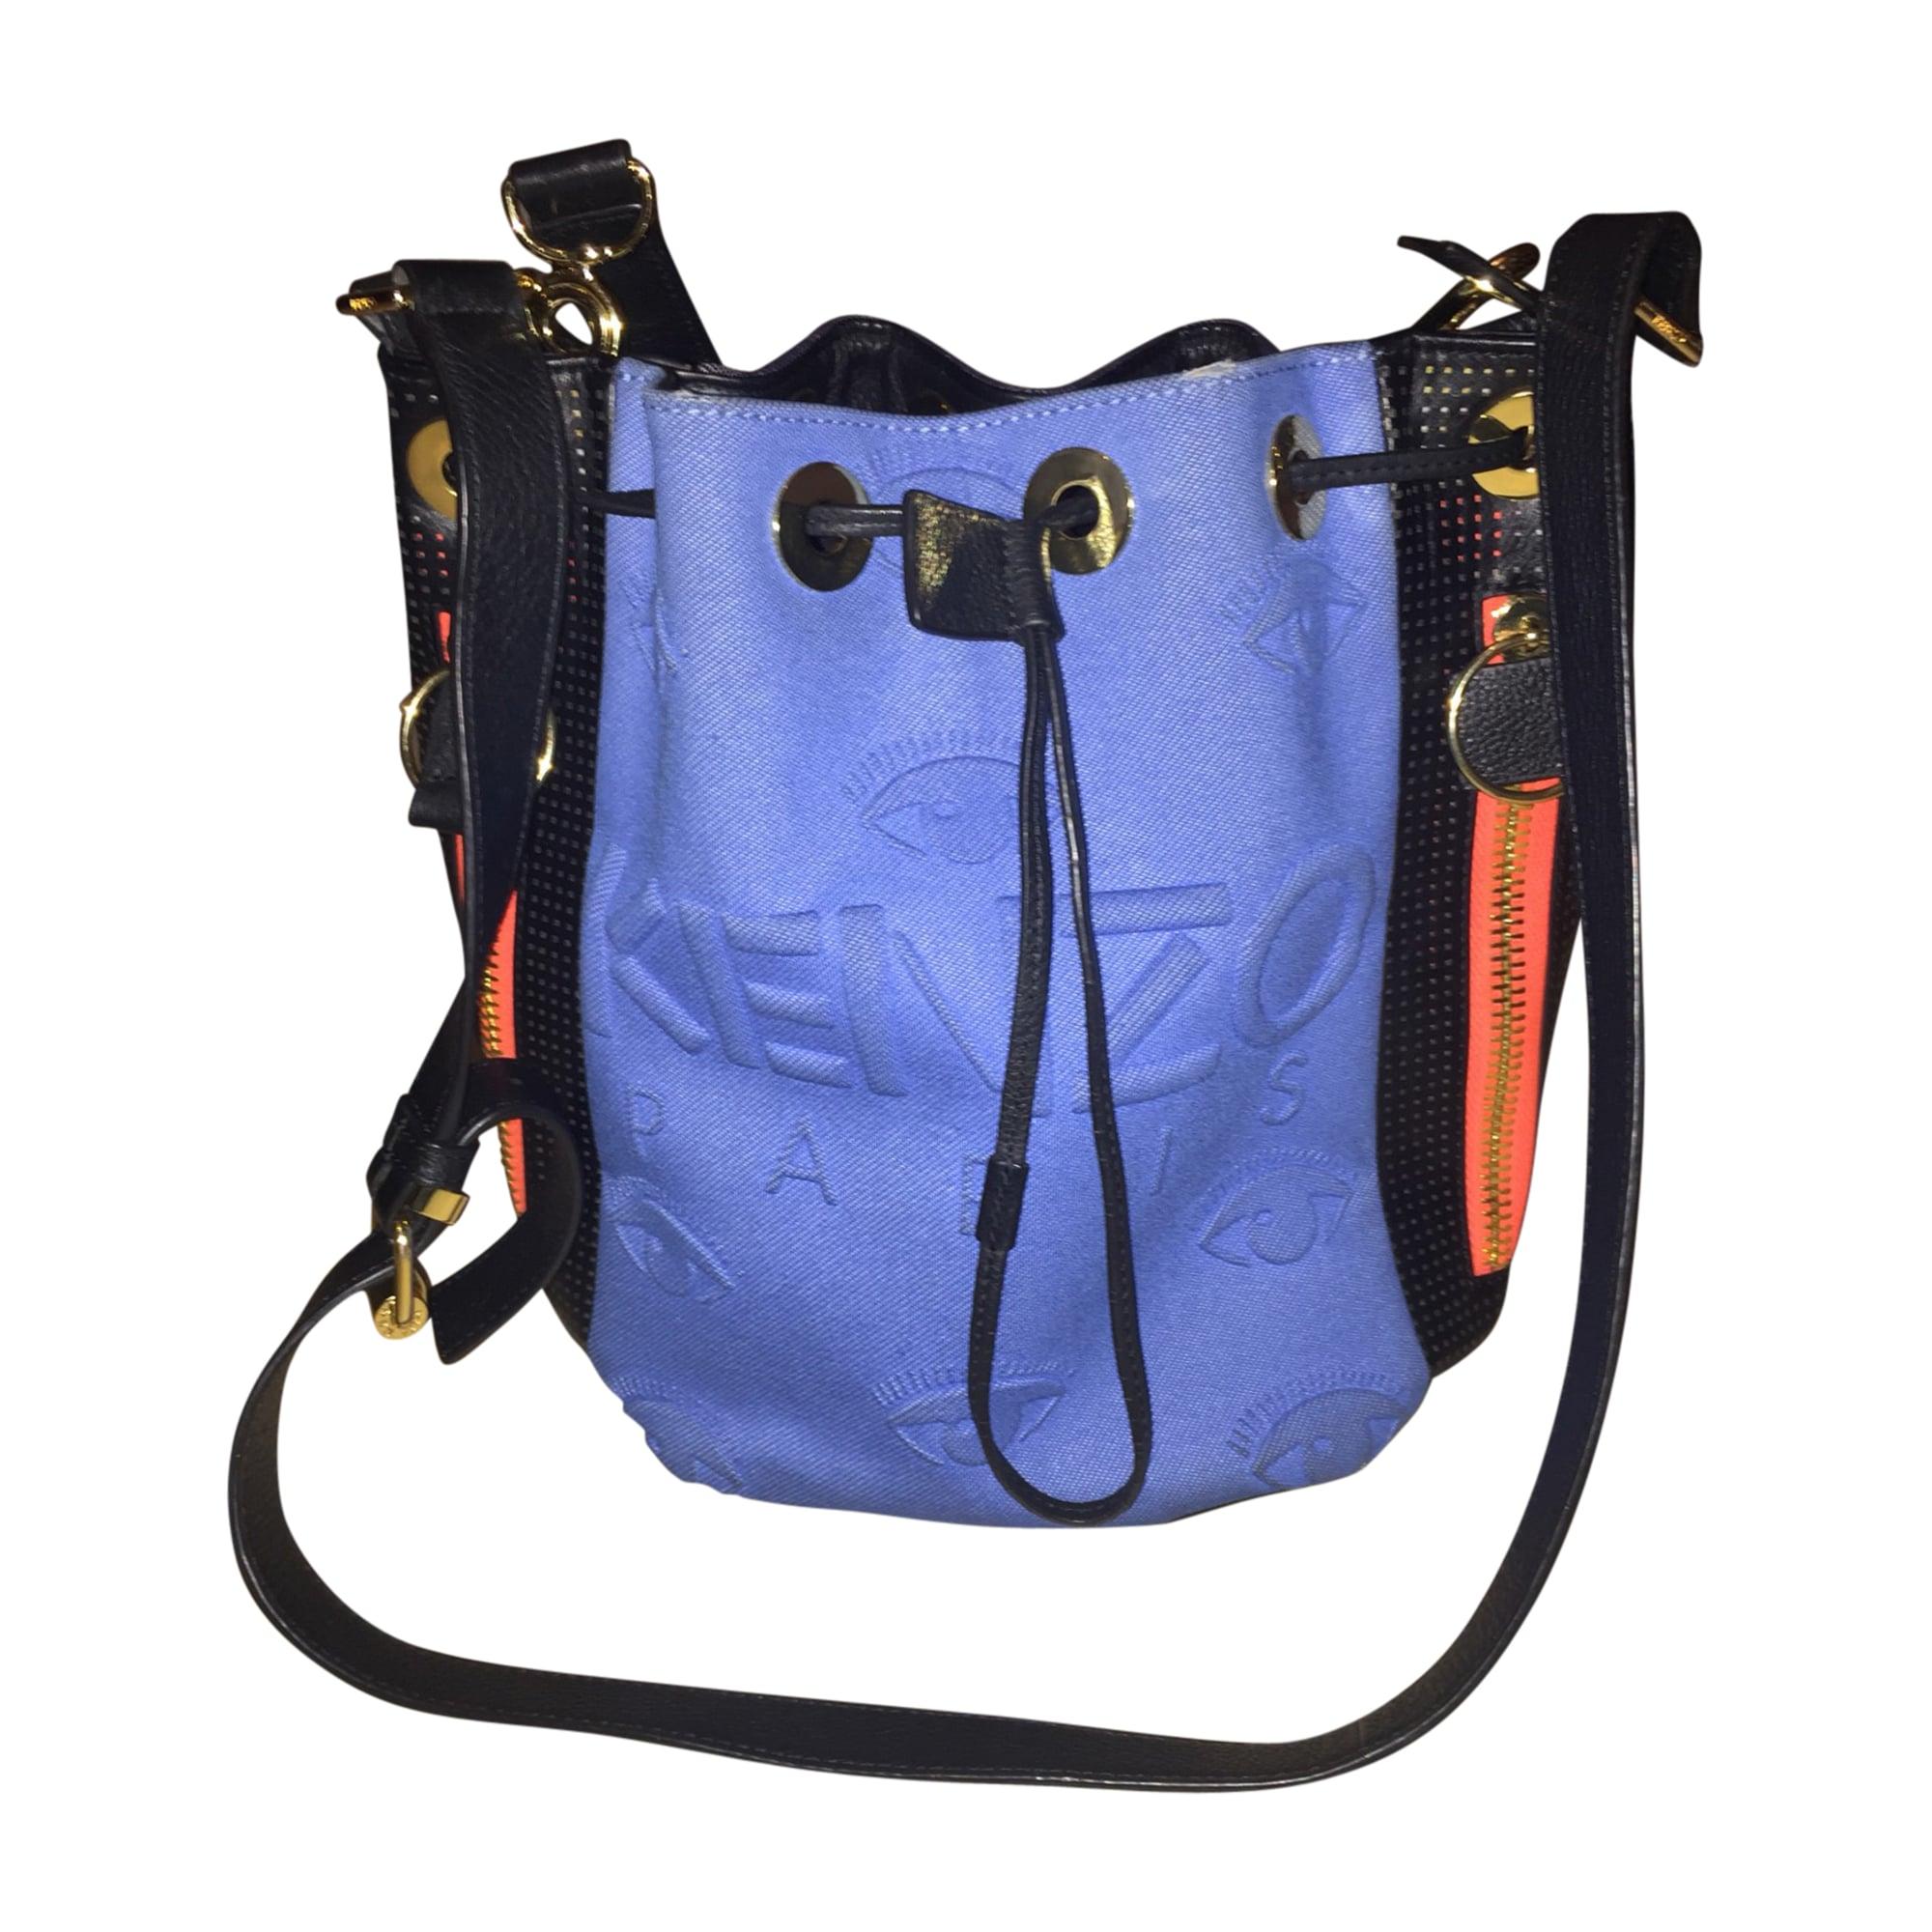 Non-Leather Handbag KENZO Blue, navy, turquoise